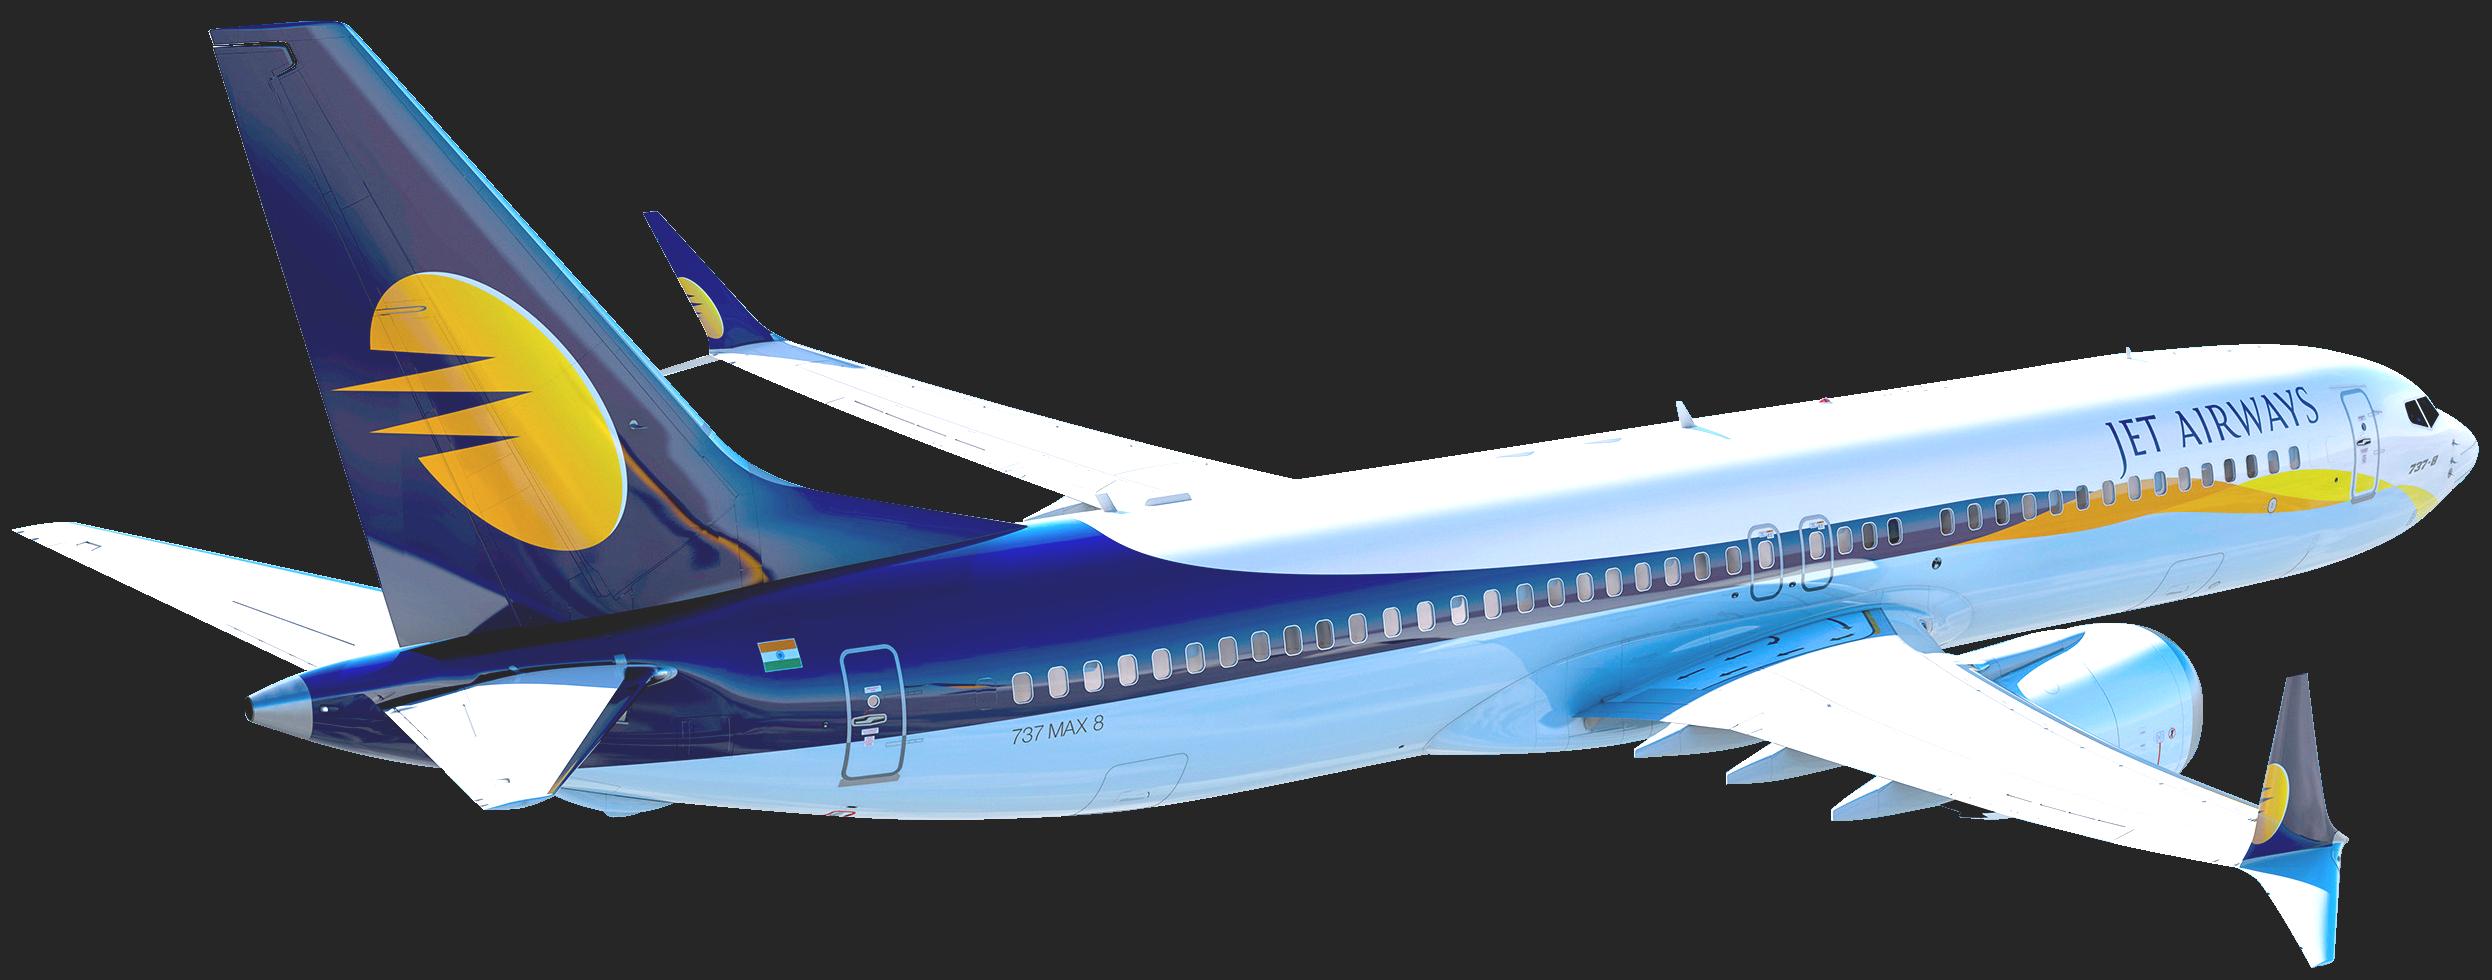 Jet Airways_737MAX